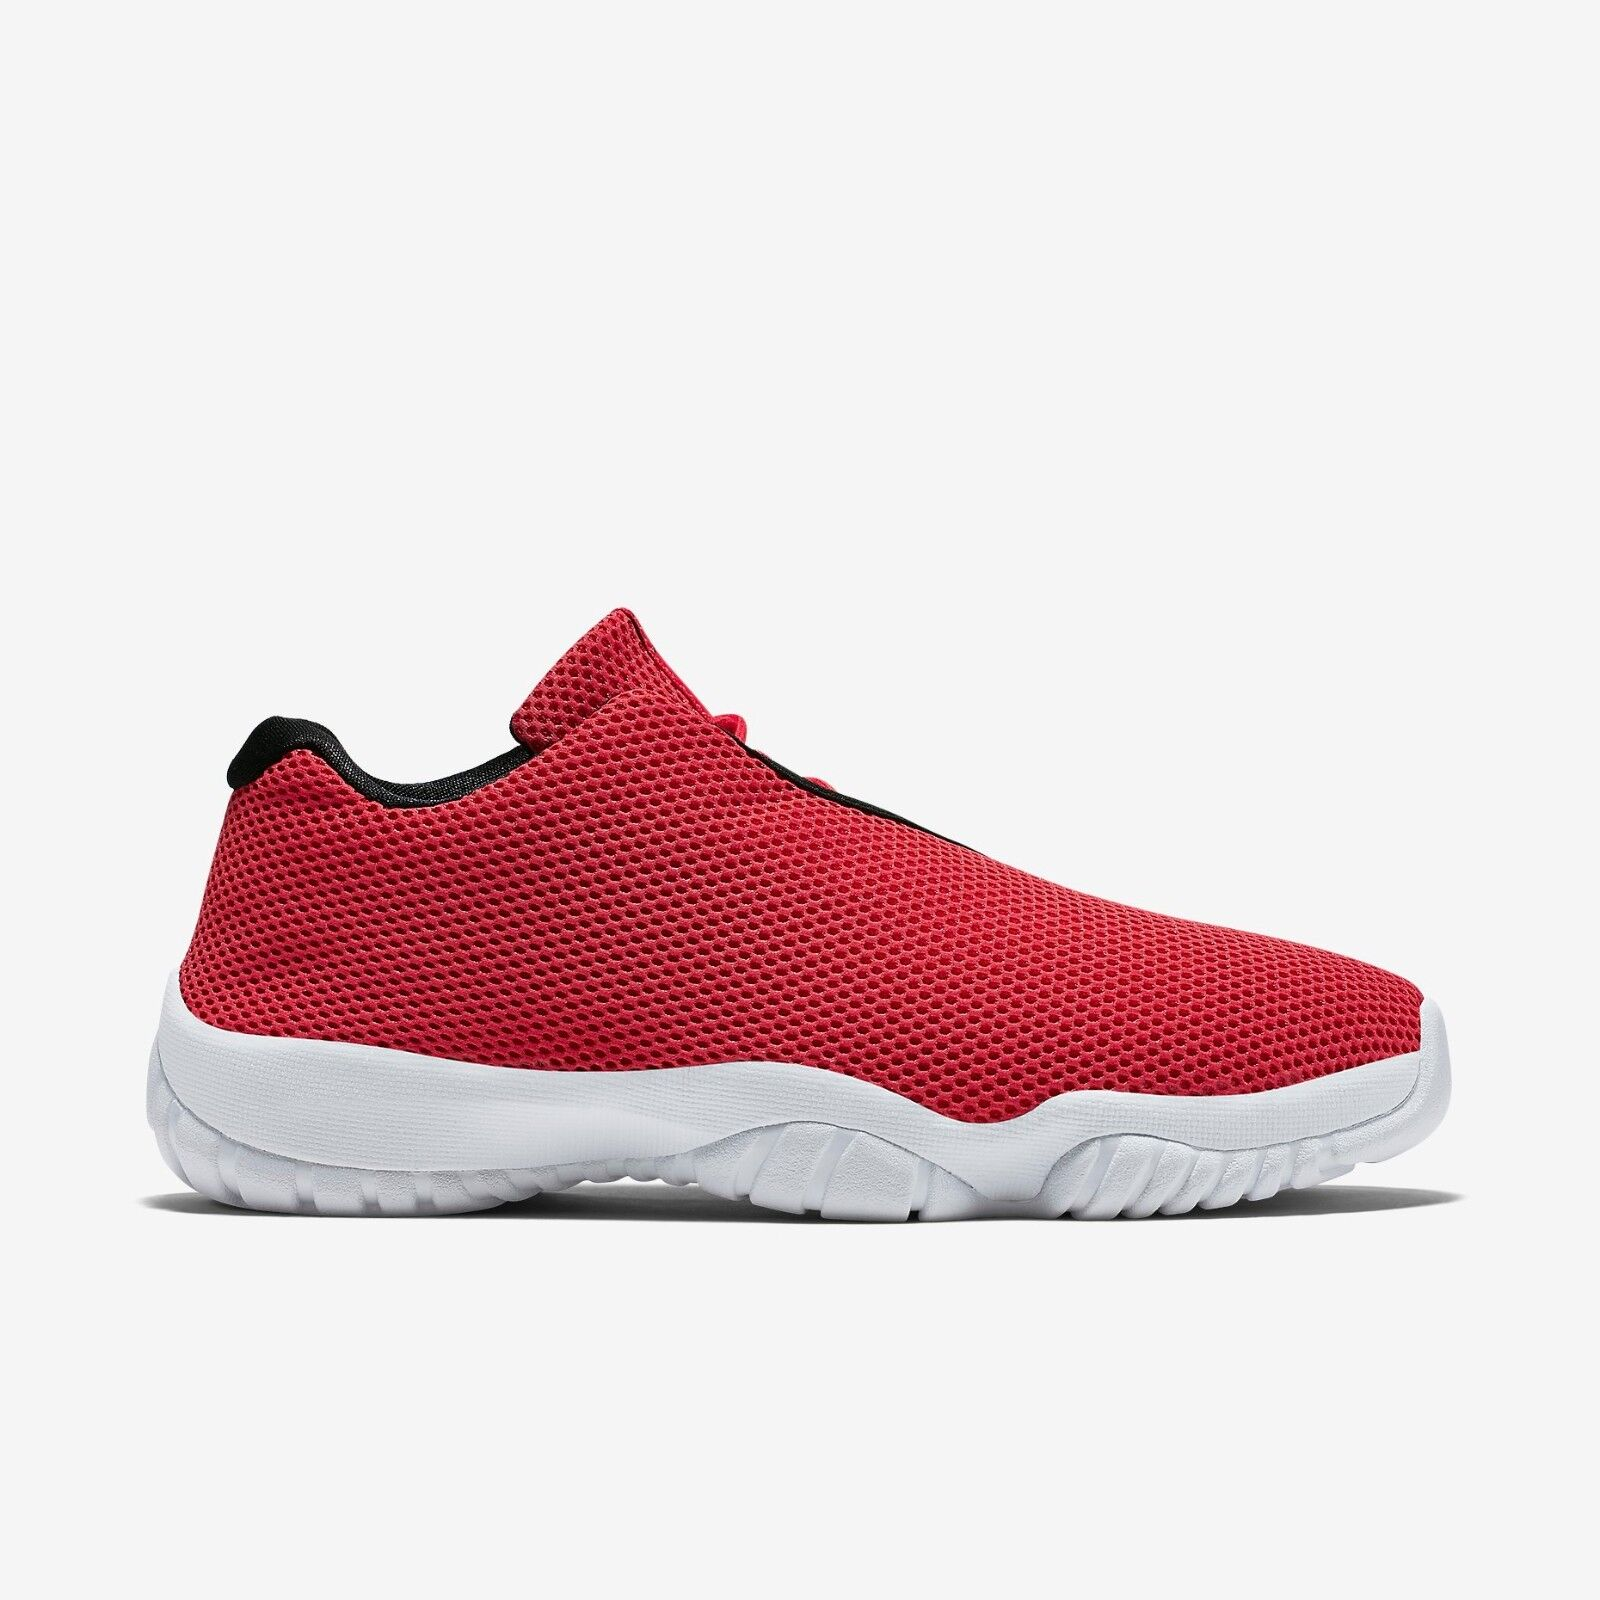 New Men&#039;s Air Jordan Future Low Shoes (718948-600)  University Red/White/Blac<wbr/>k